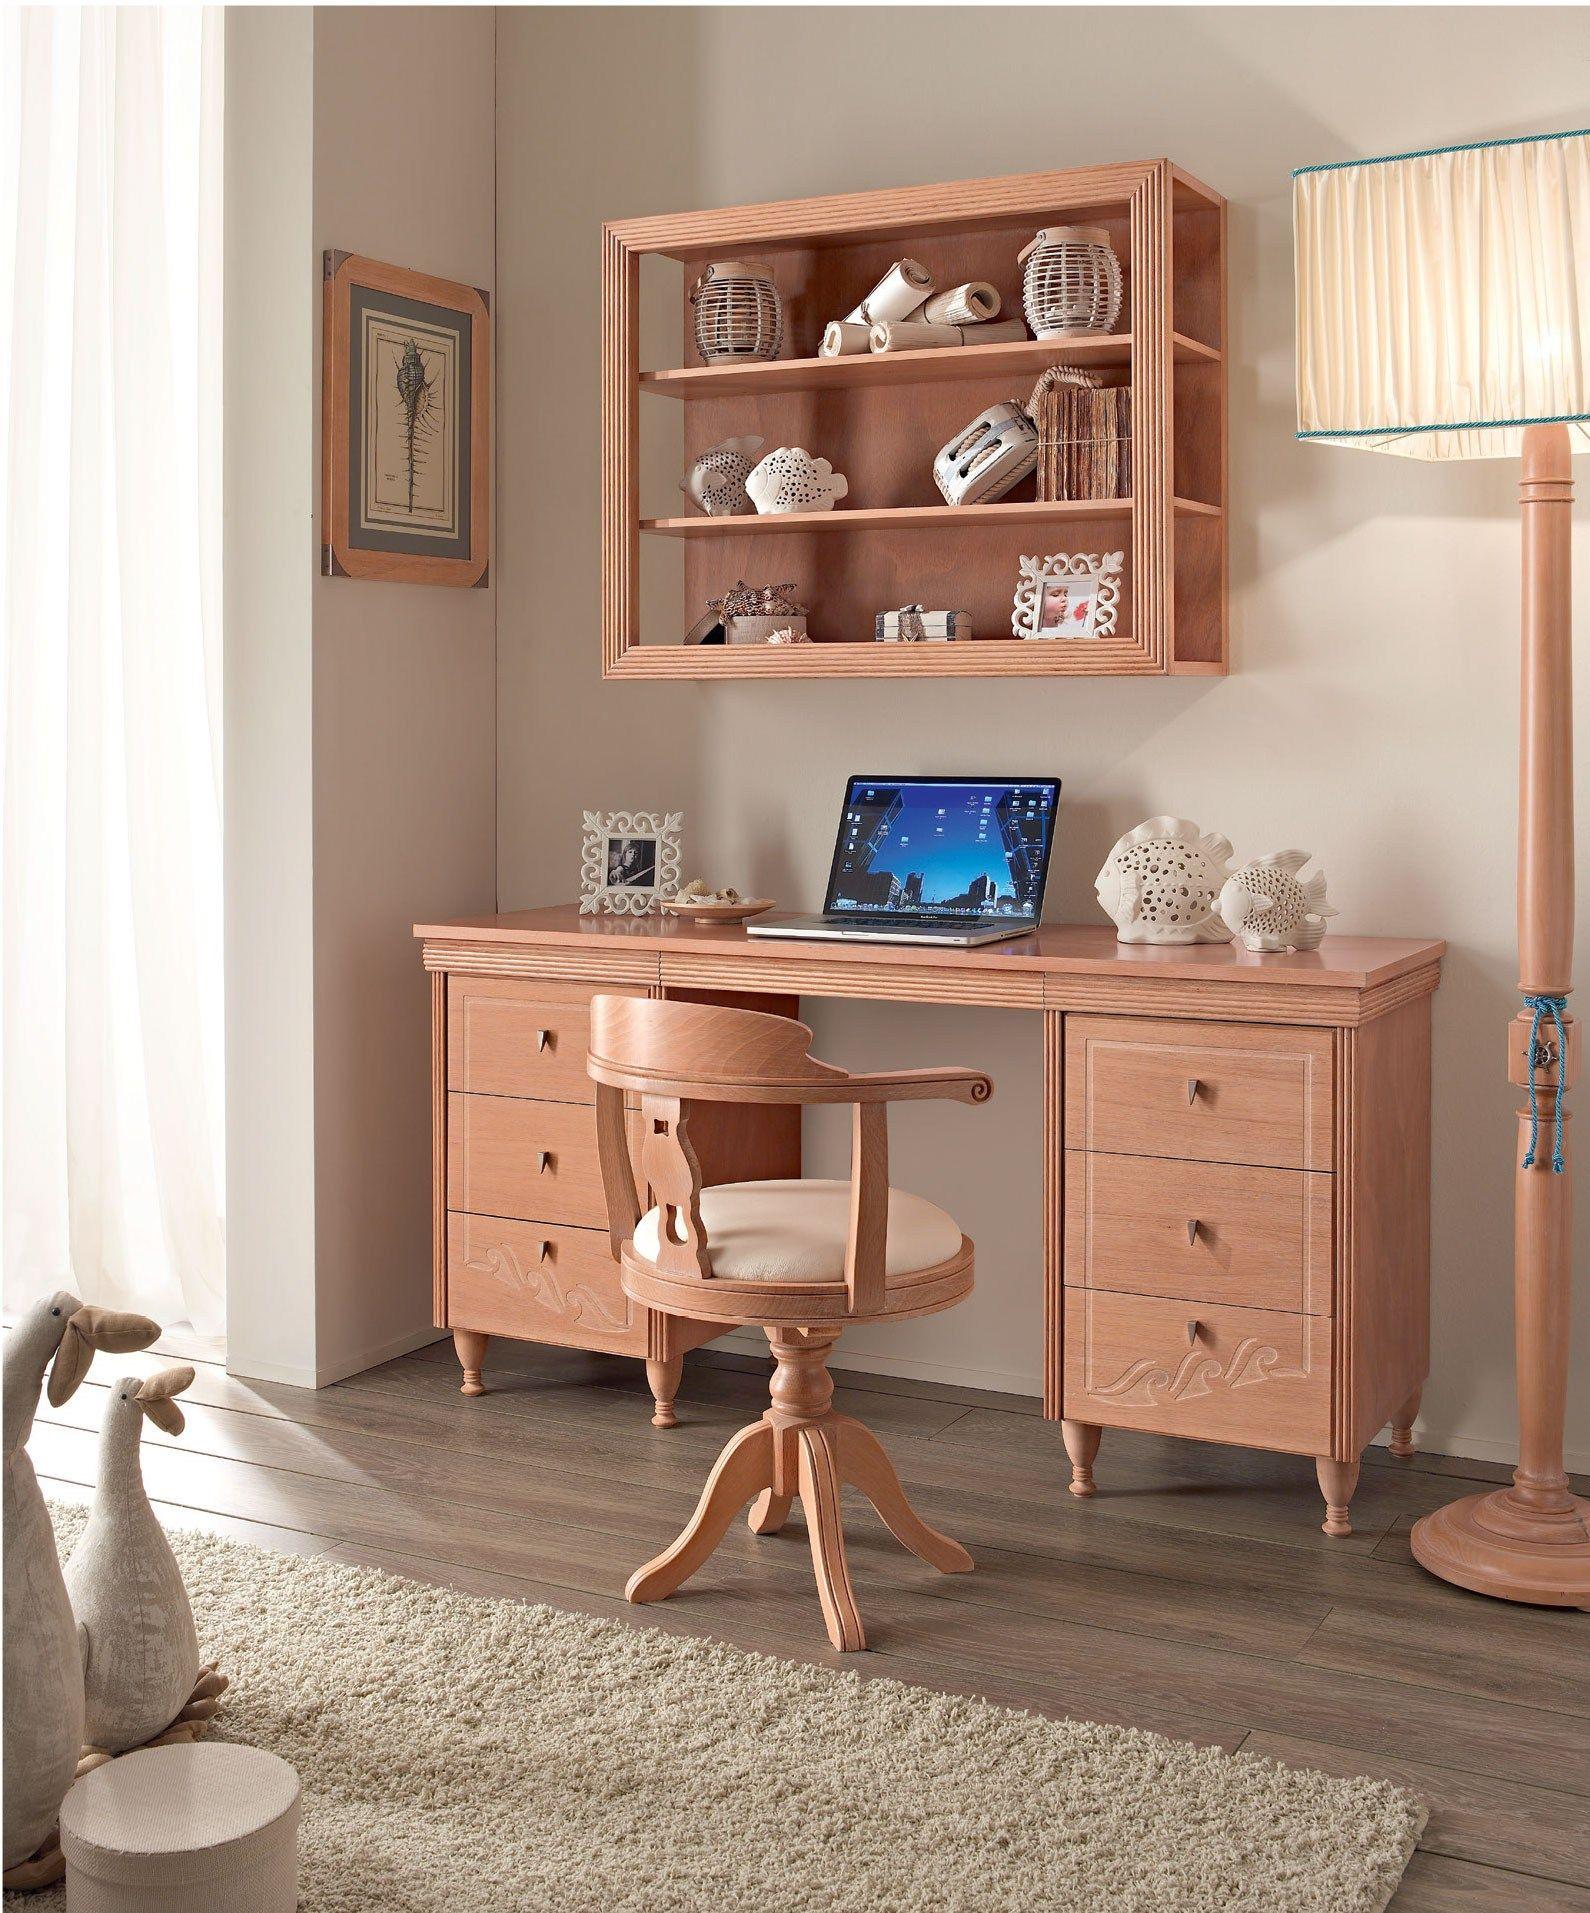 Onda escritorio con cajones by caroti - Modelos de escritorios de madera ...